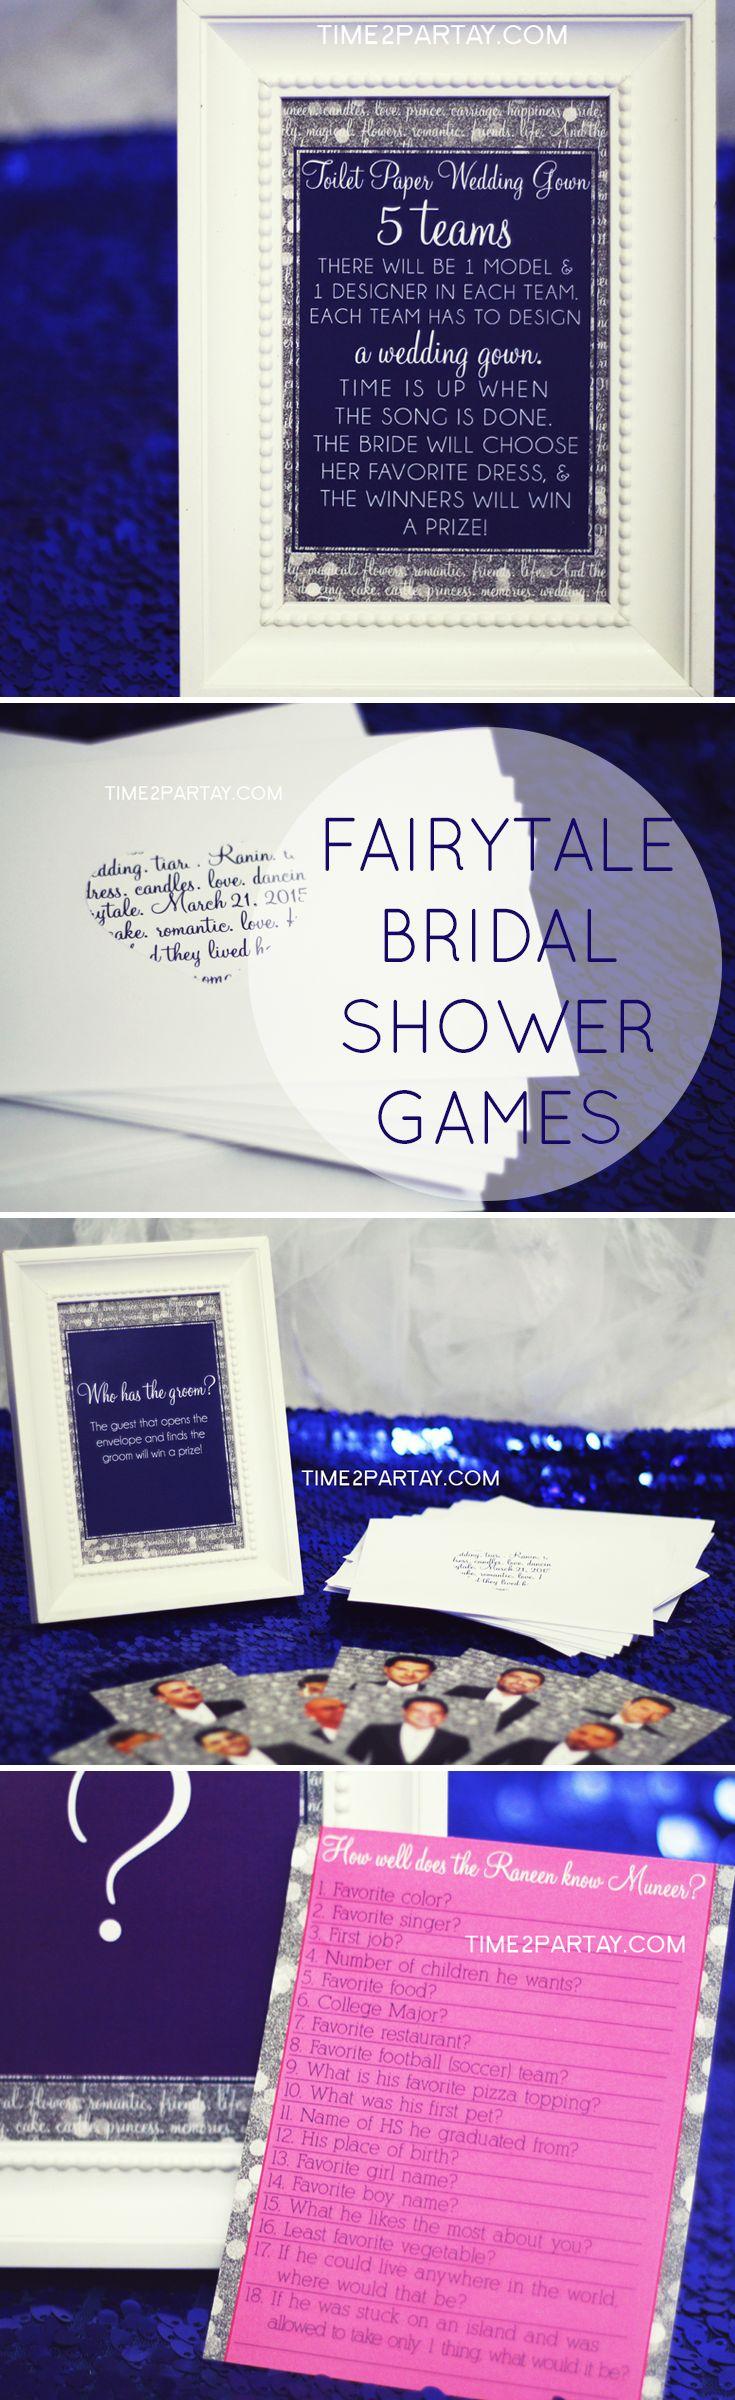 time2partay.blogspot.com Games at a Fairytale Bridal Shower #princess…